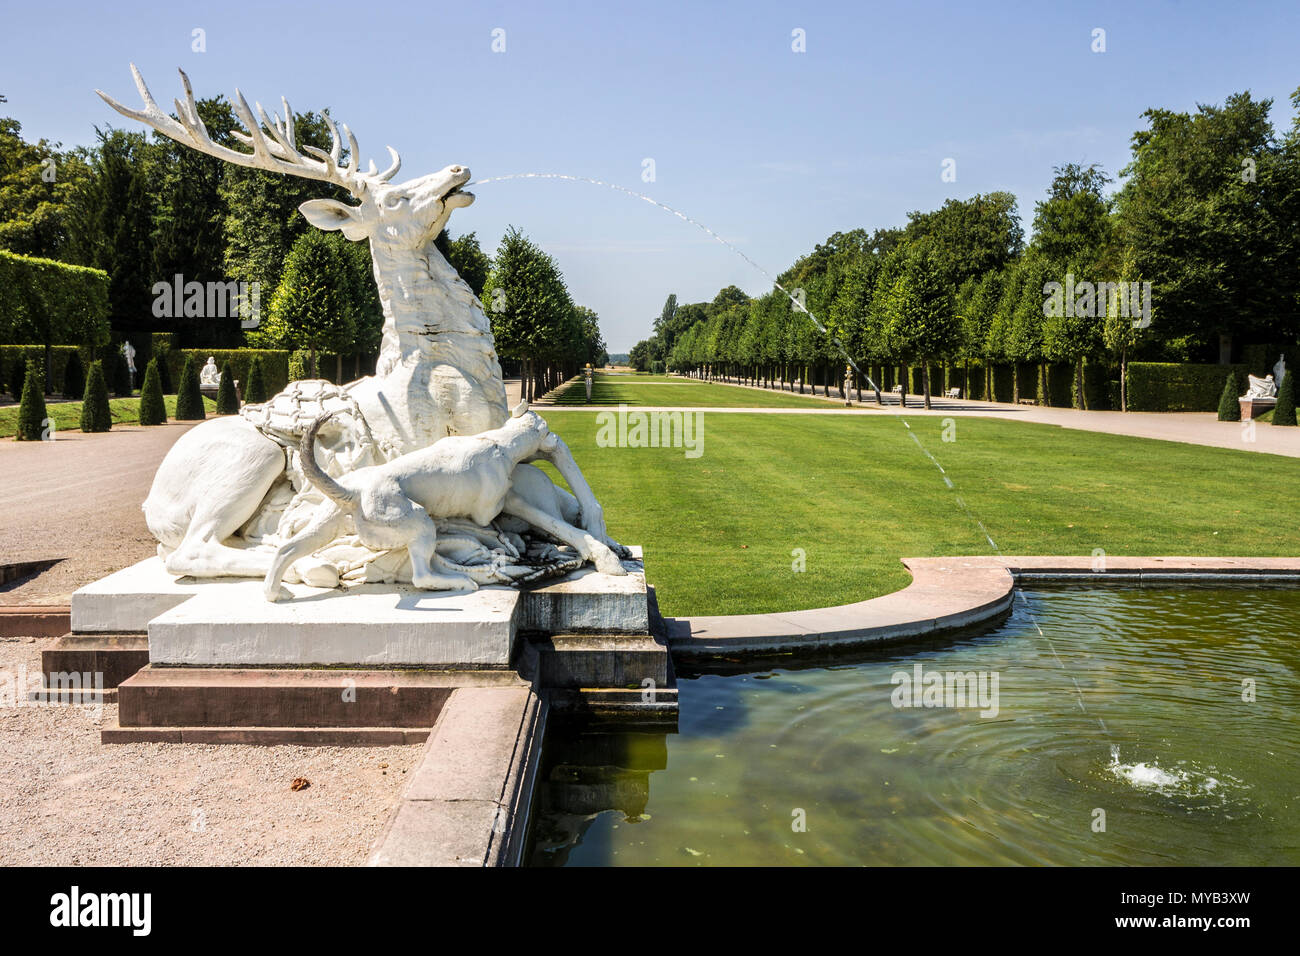 Schwetzingen, Germany. Gardens of the Schwetzingen Palace (Schloss Schwetzingen), ancient summer residence of the Electors Palatine Charles III Philip - Stock Image